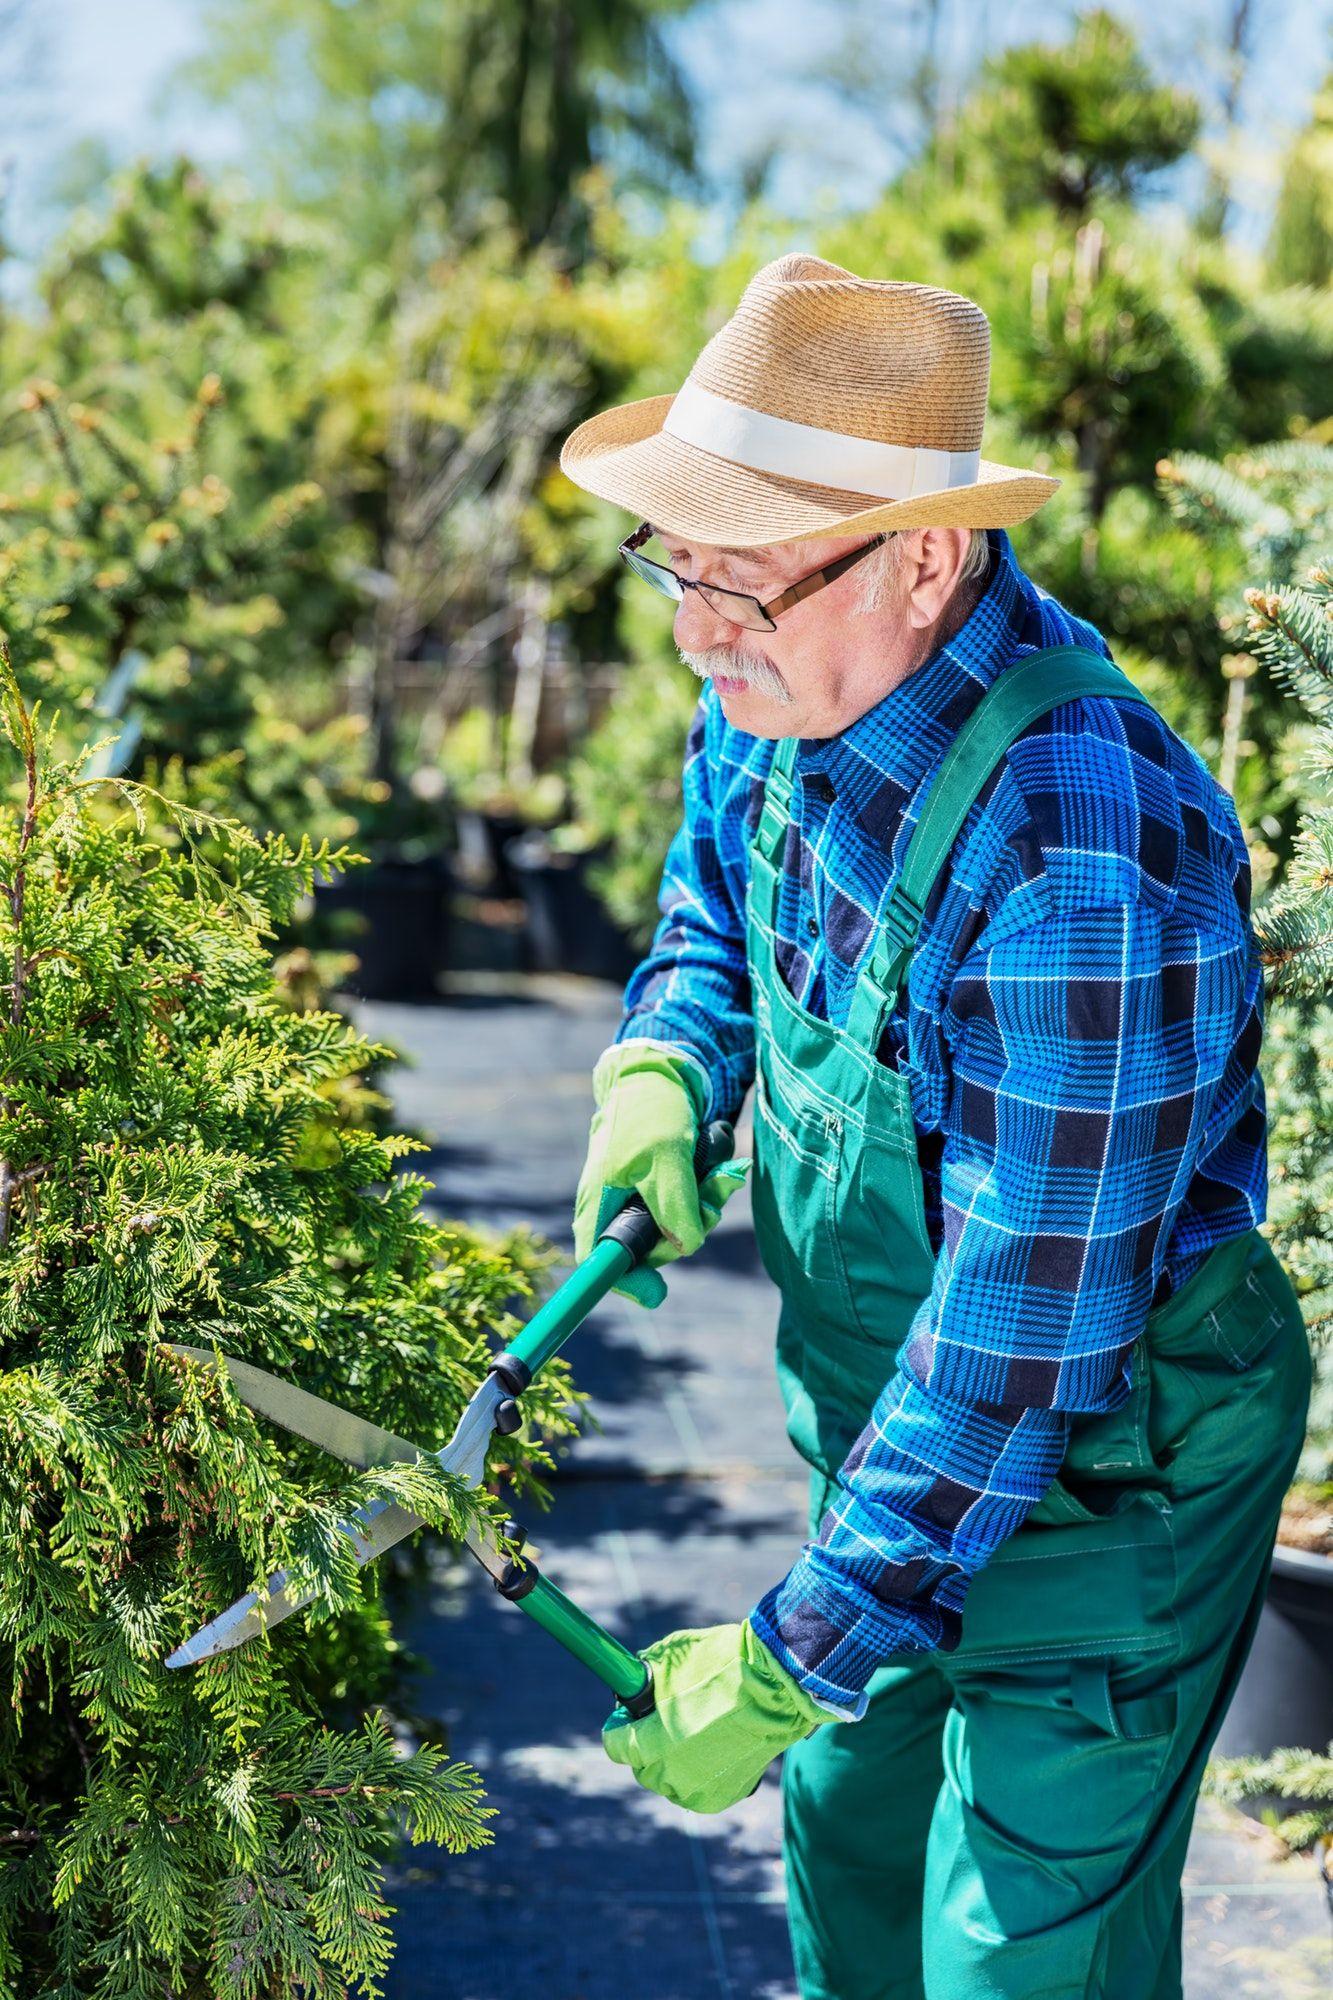 Senior gardener cutting a tree in a garden.